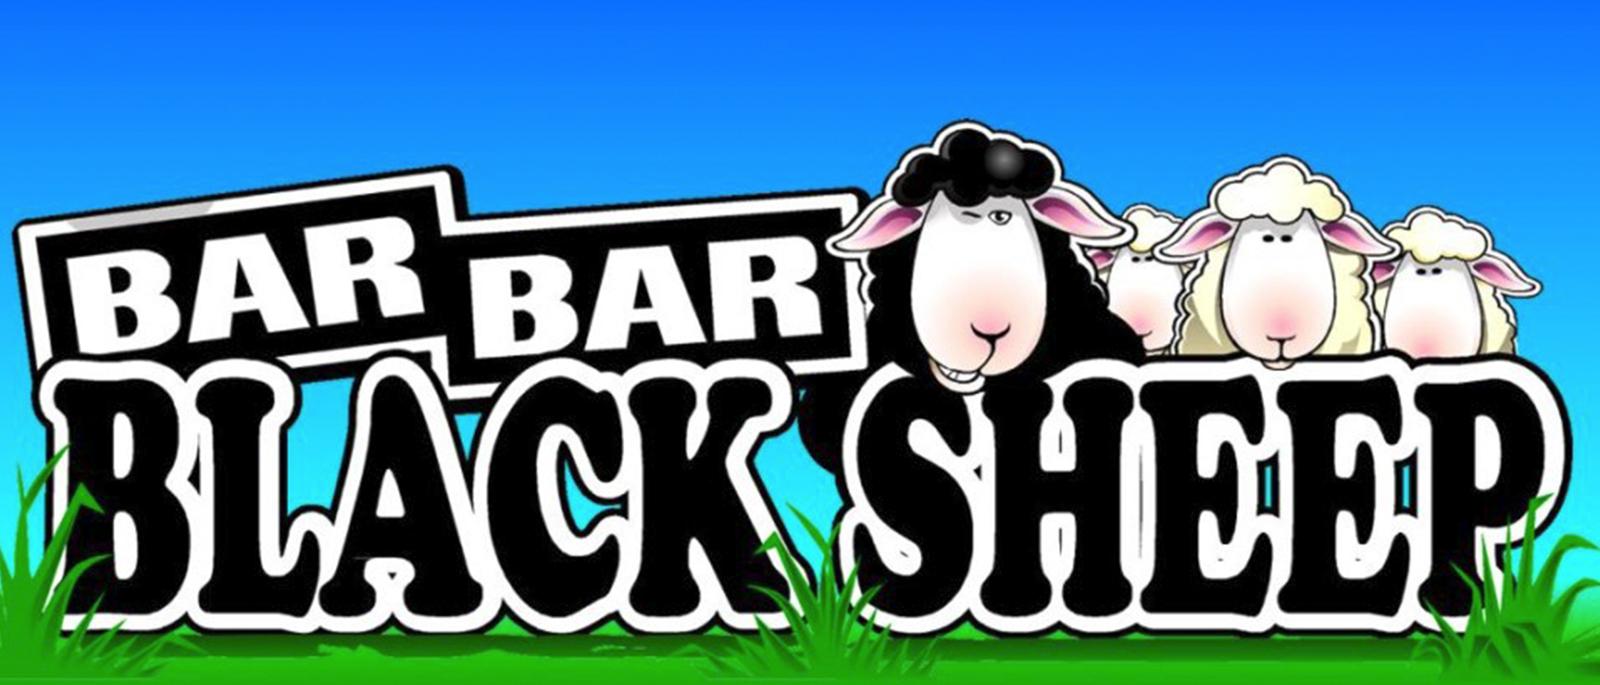 Bar Bar Black Sheep Slot - MicroGaming - Rizk Online Casino Deutschland